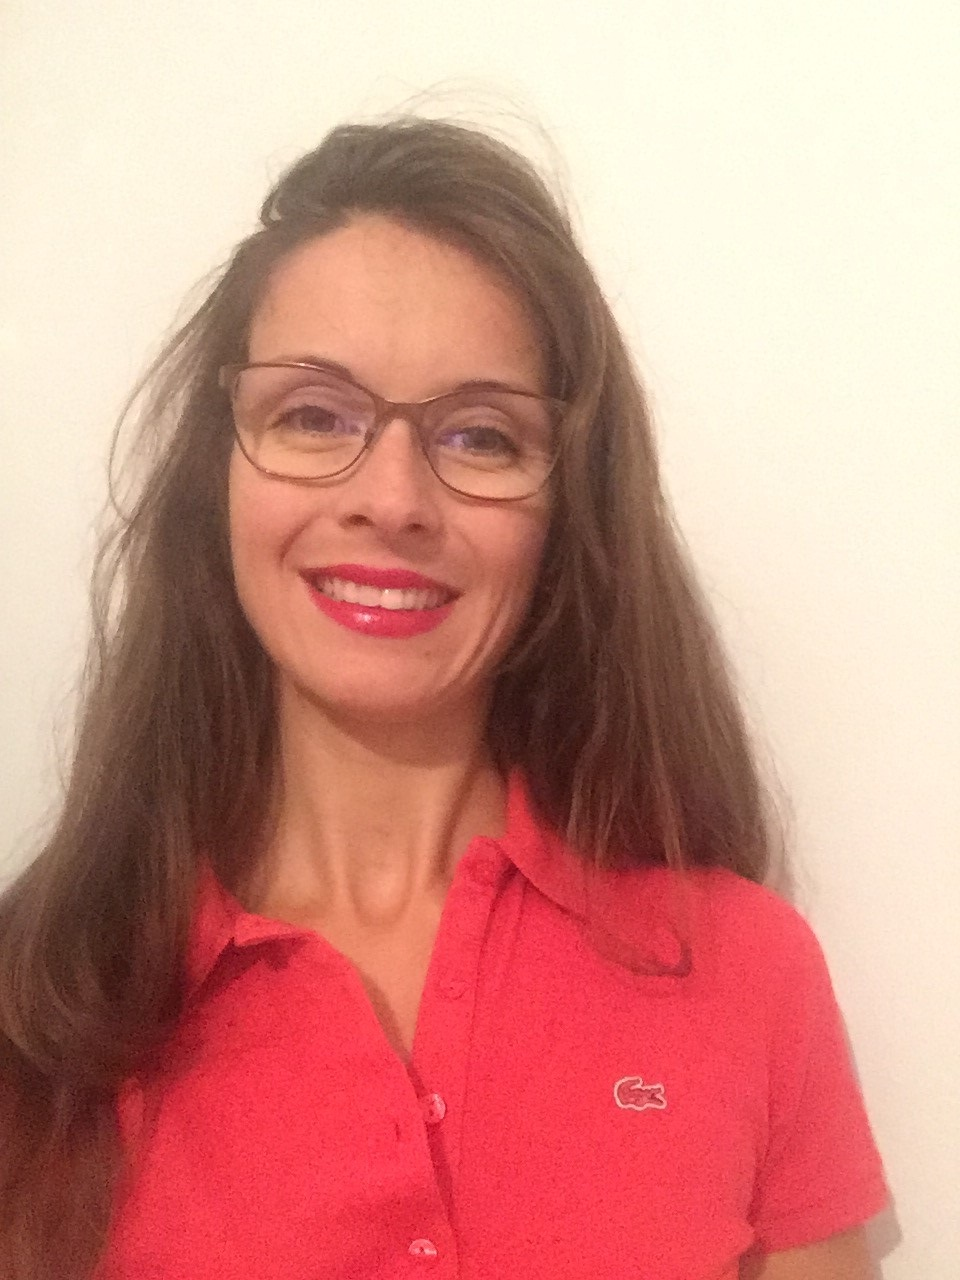 Andrea Miehling